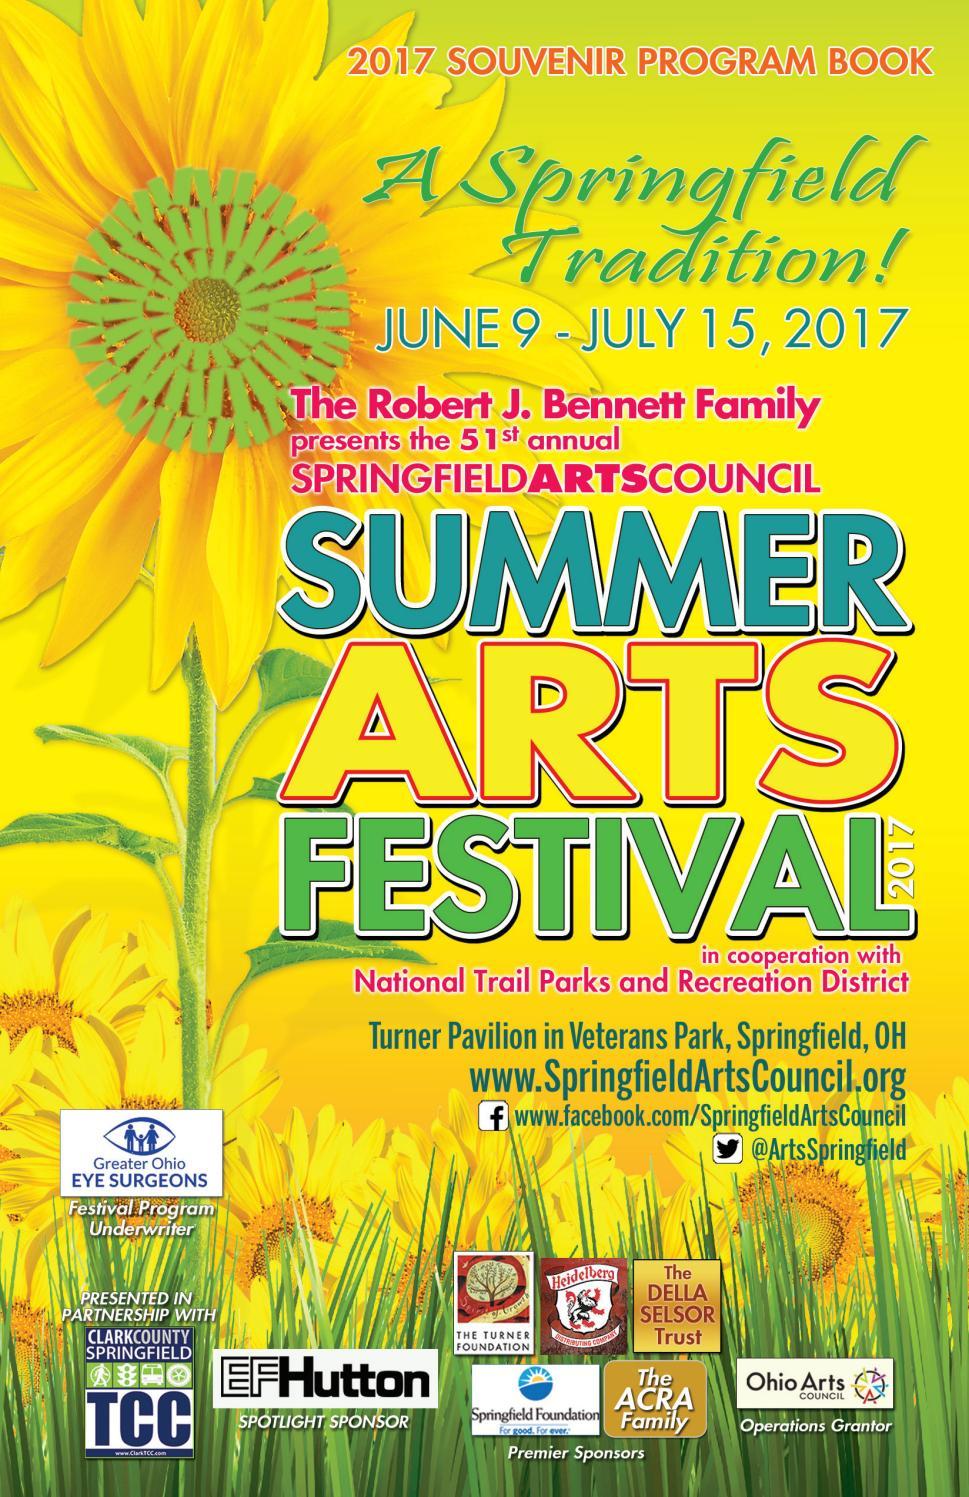 Jeff Wyler Springfield >> Summer Arts Festival 2017 Program Book by Springfield Arts Council - issuu